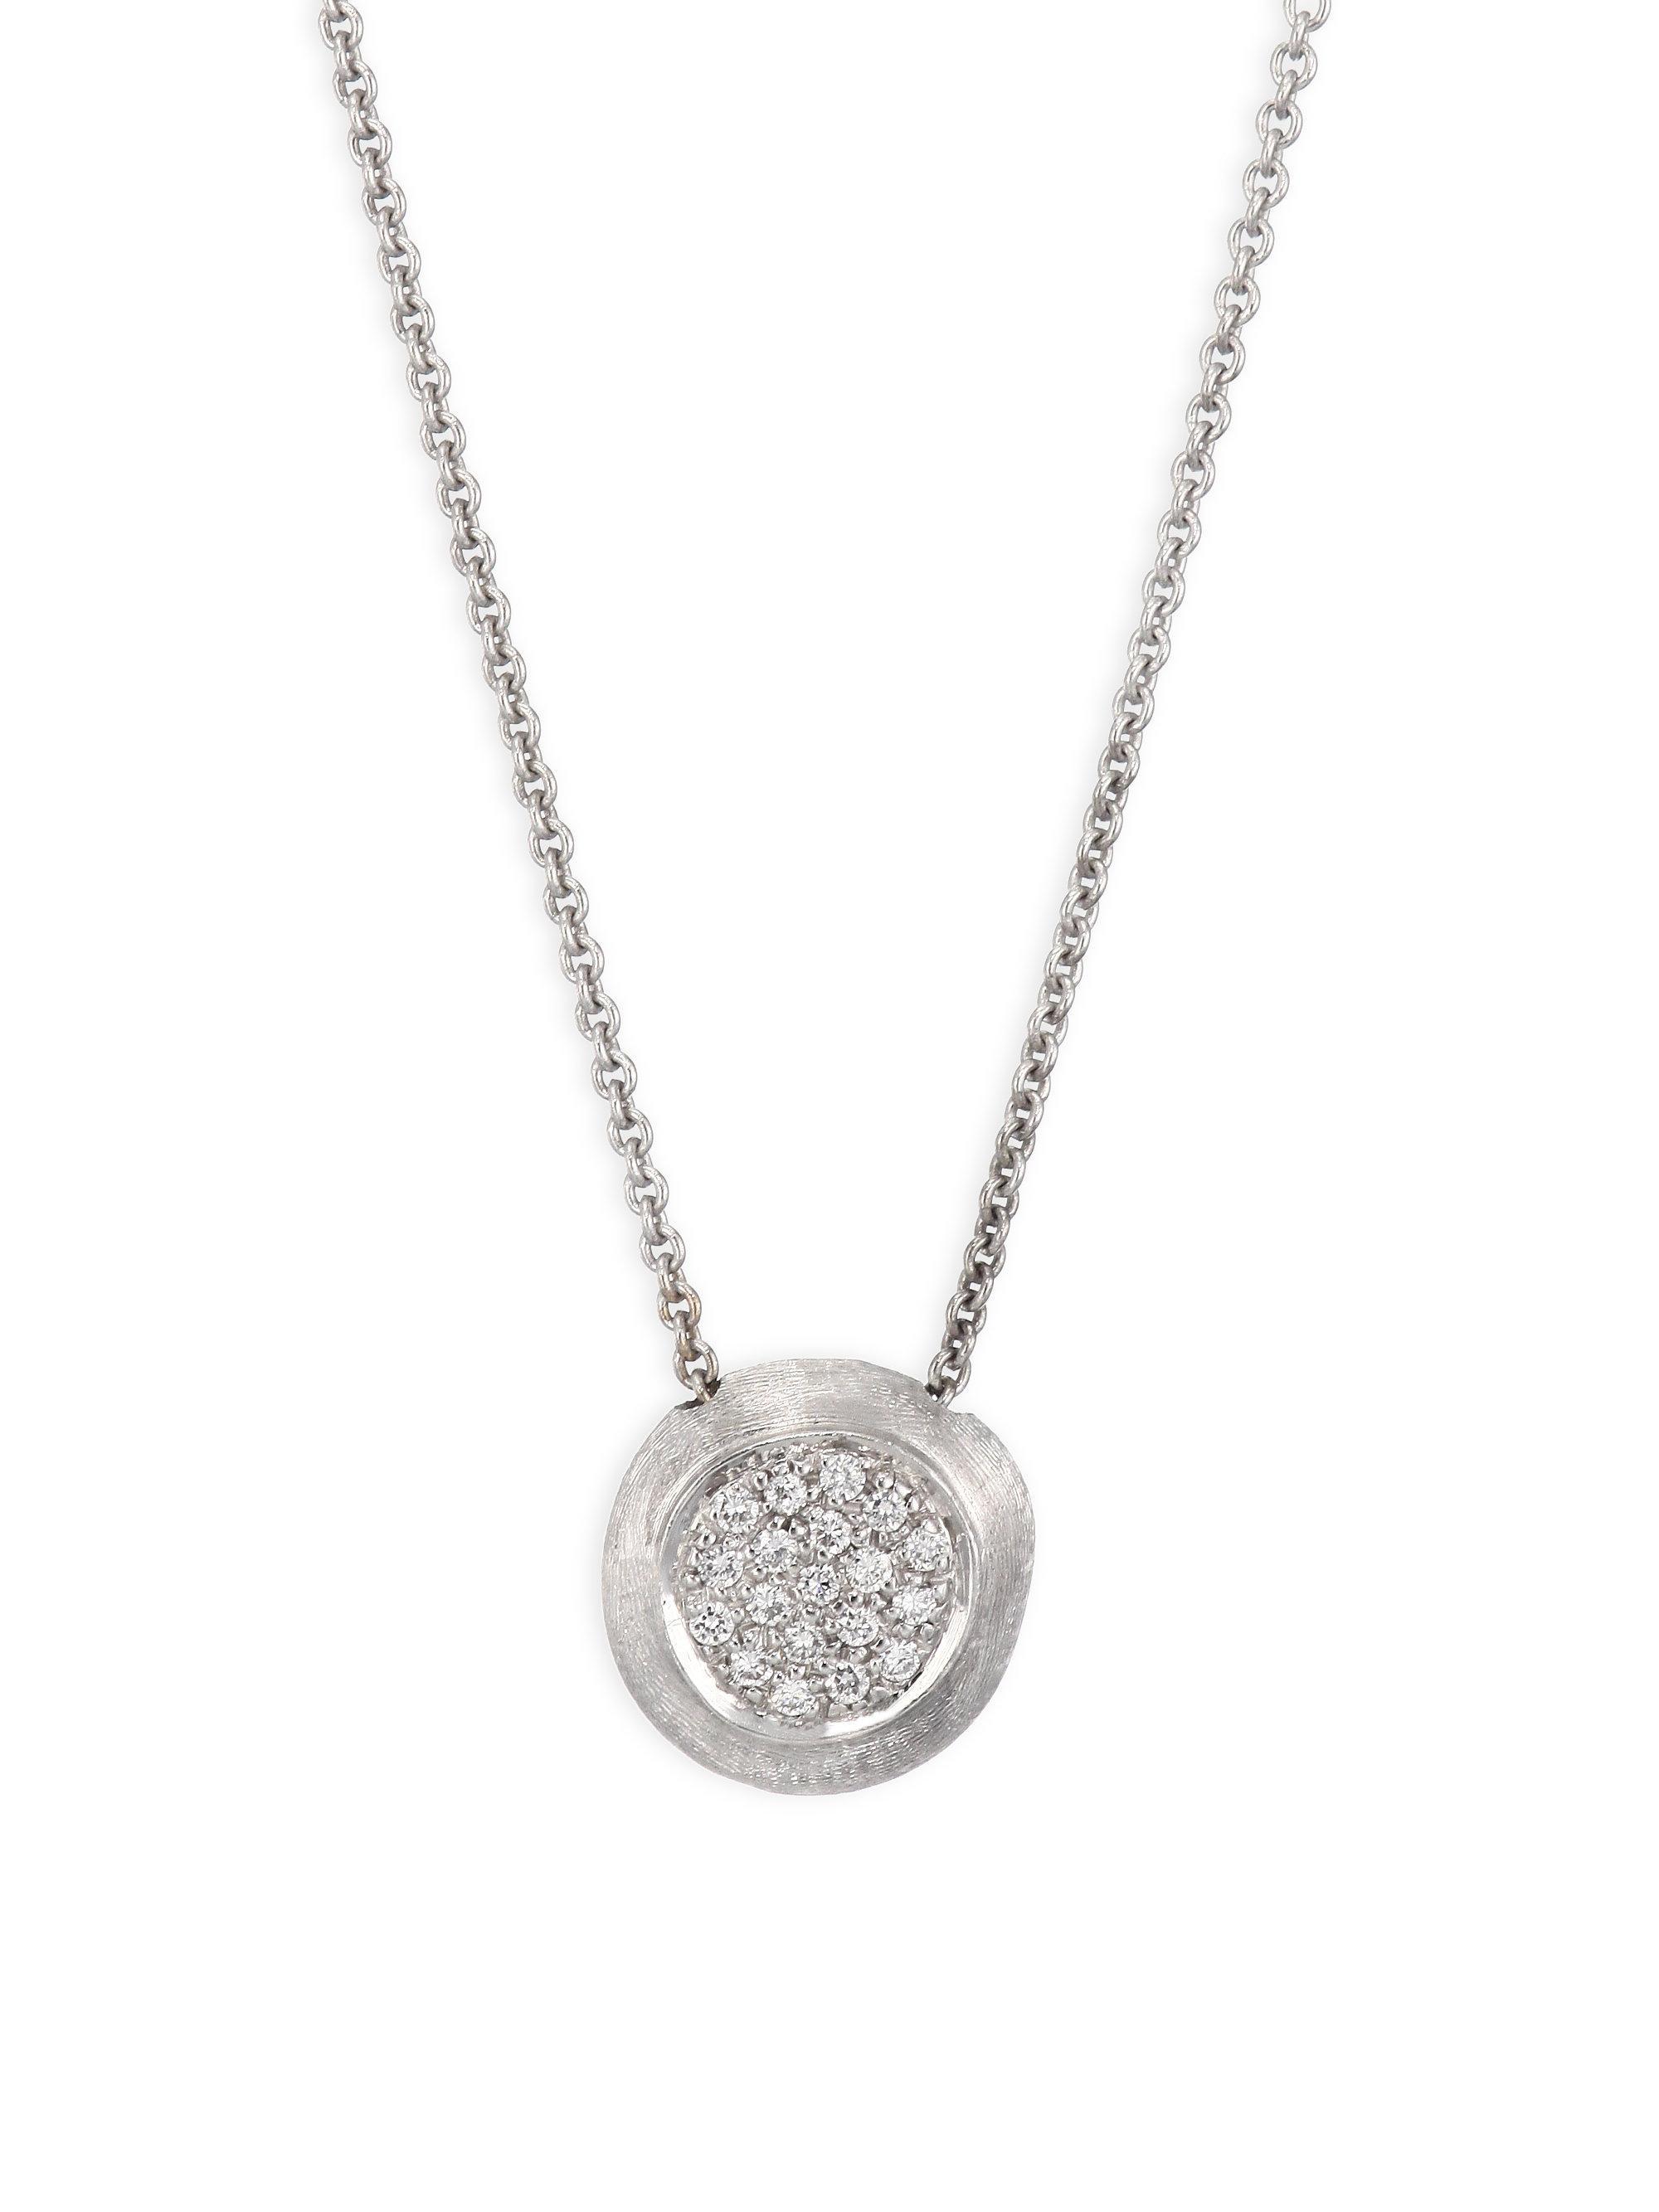 Marco Bicego 18k Delicati Round Diamond Pavé Pendant Necklace JeZdrBazgb